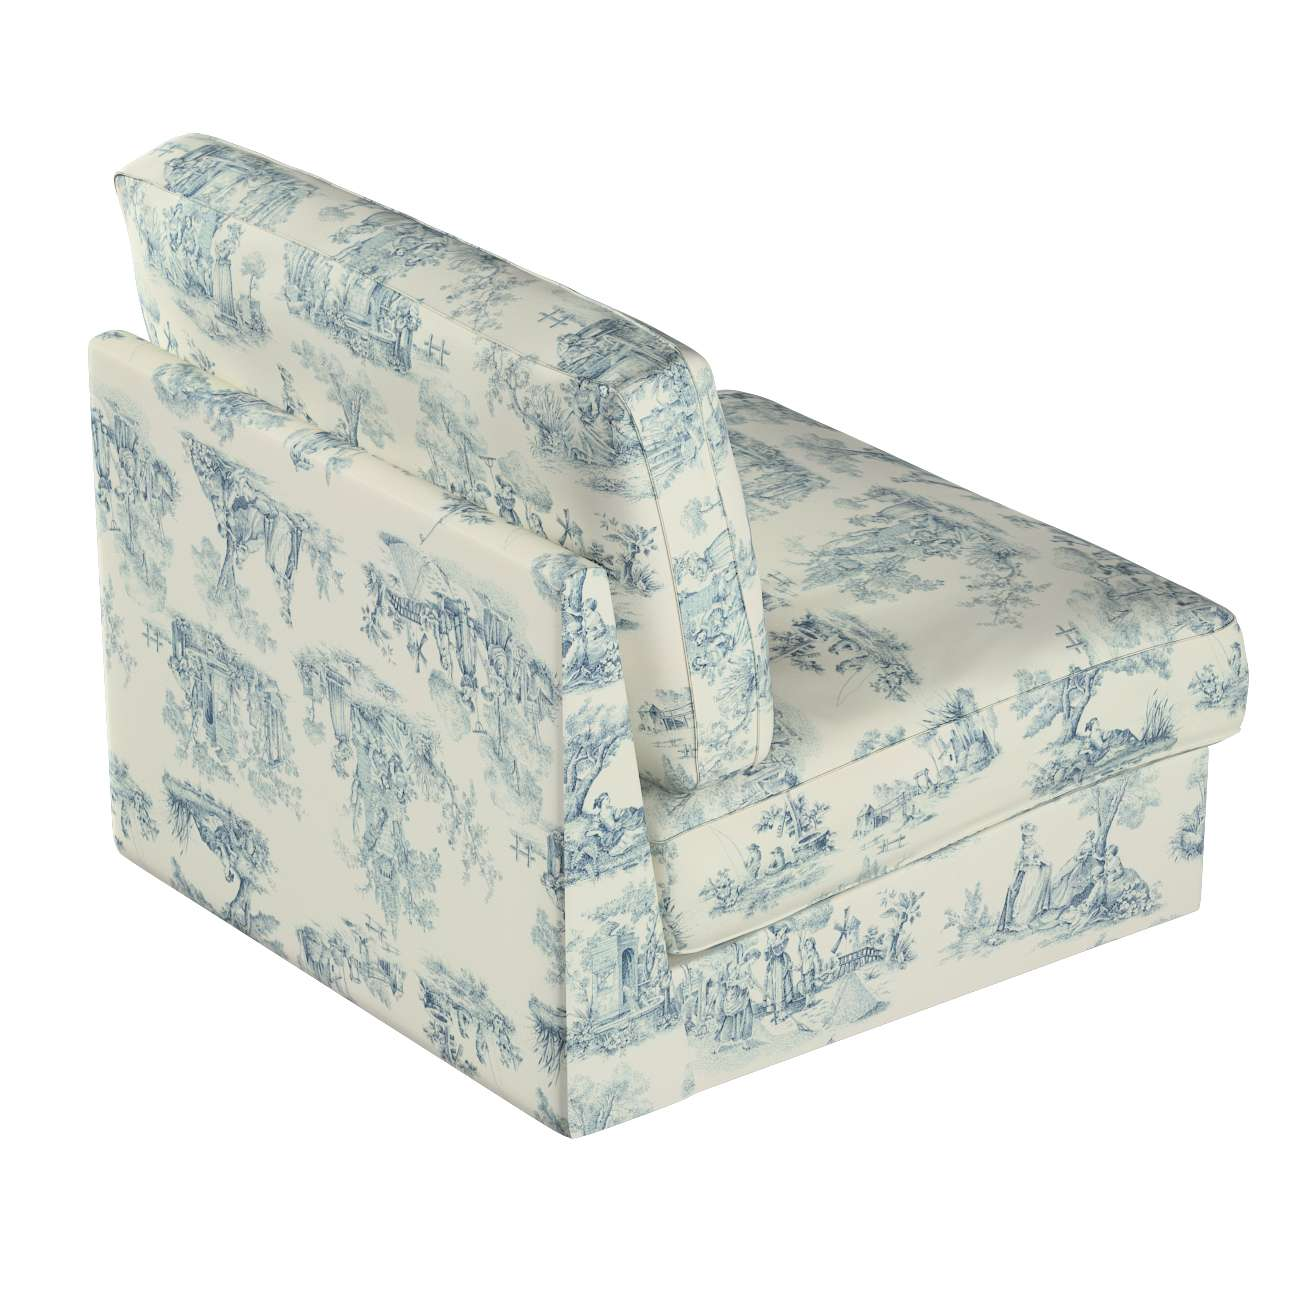 Pokrowiec na fotel Kivik w kolekcji Avinon, tkanina: 132-66